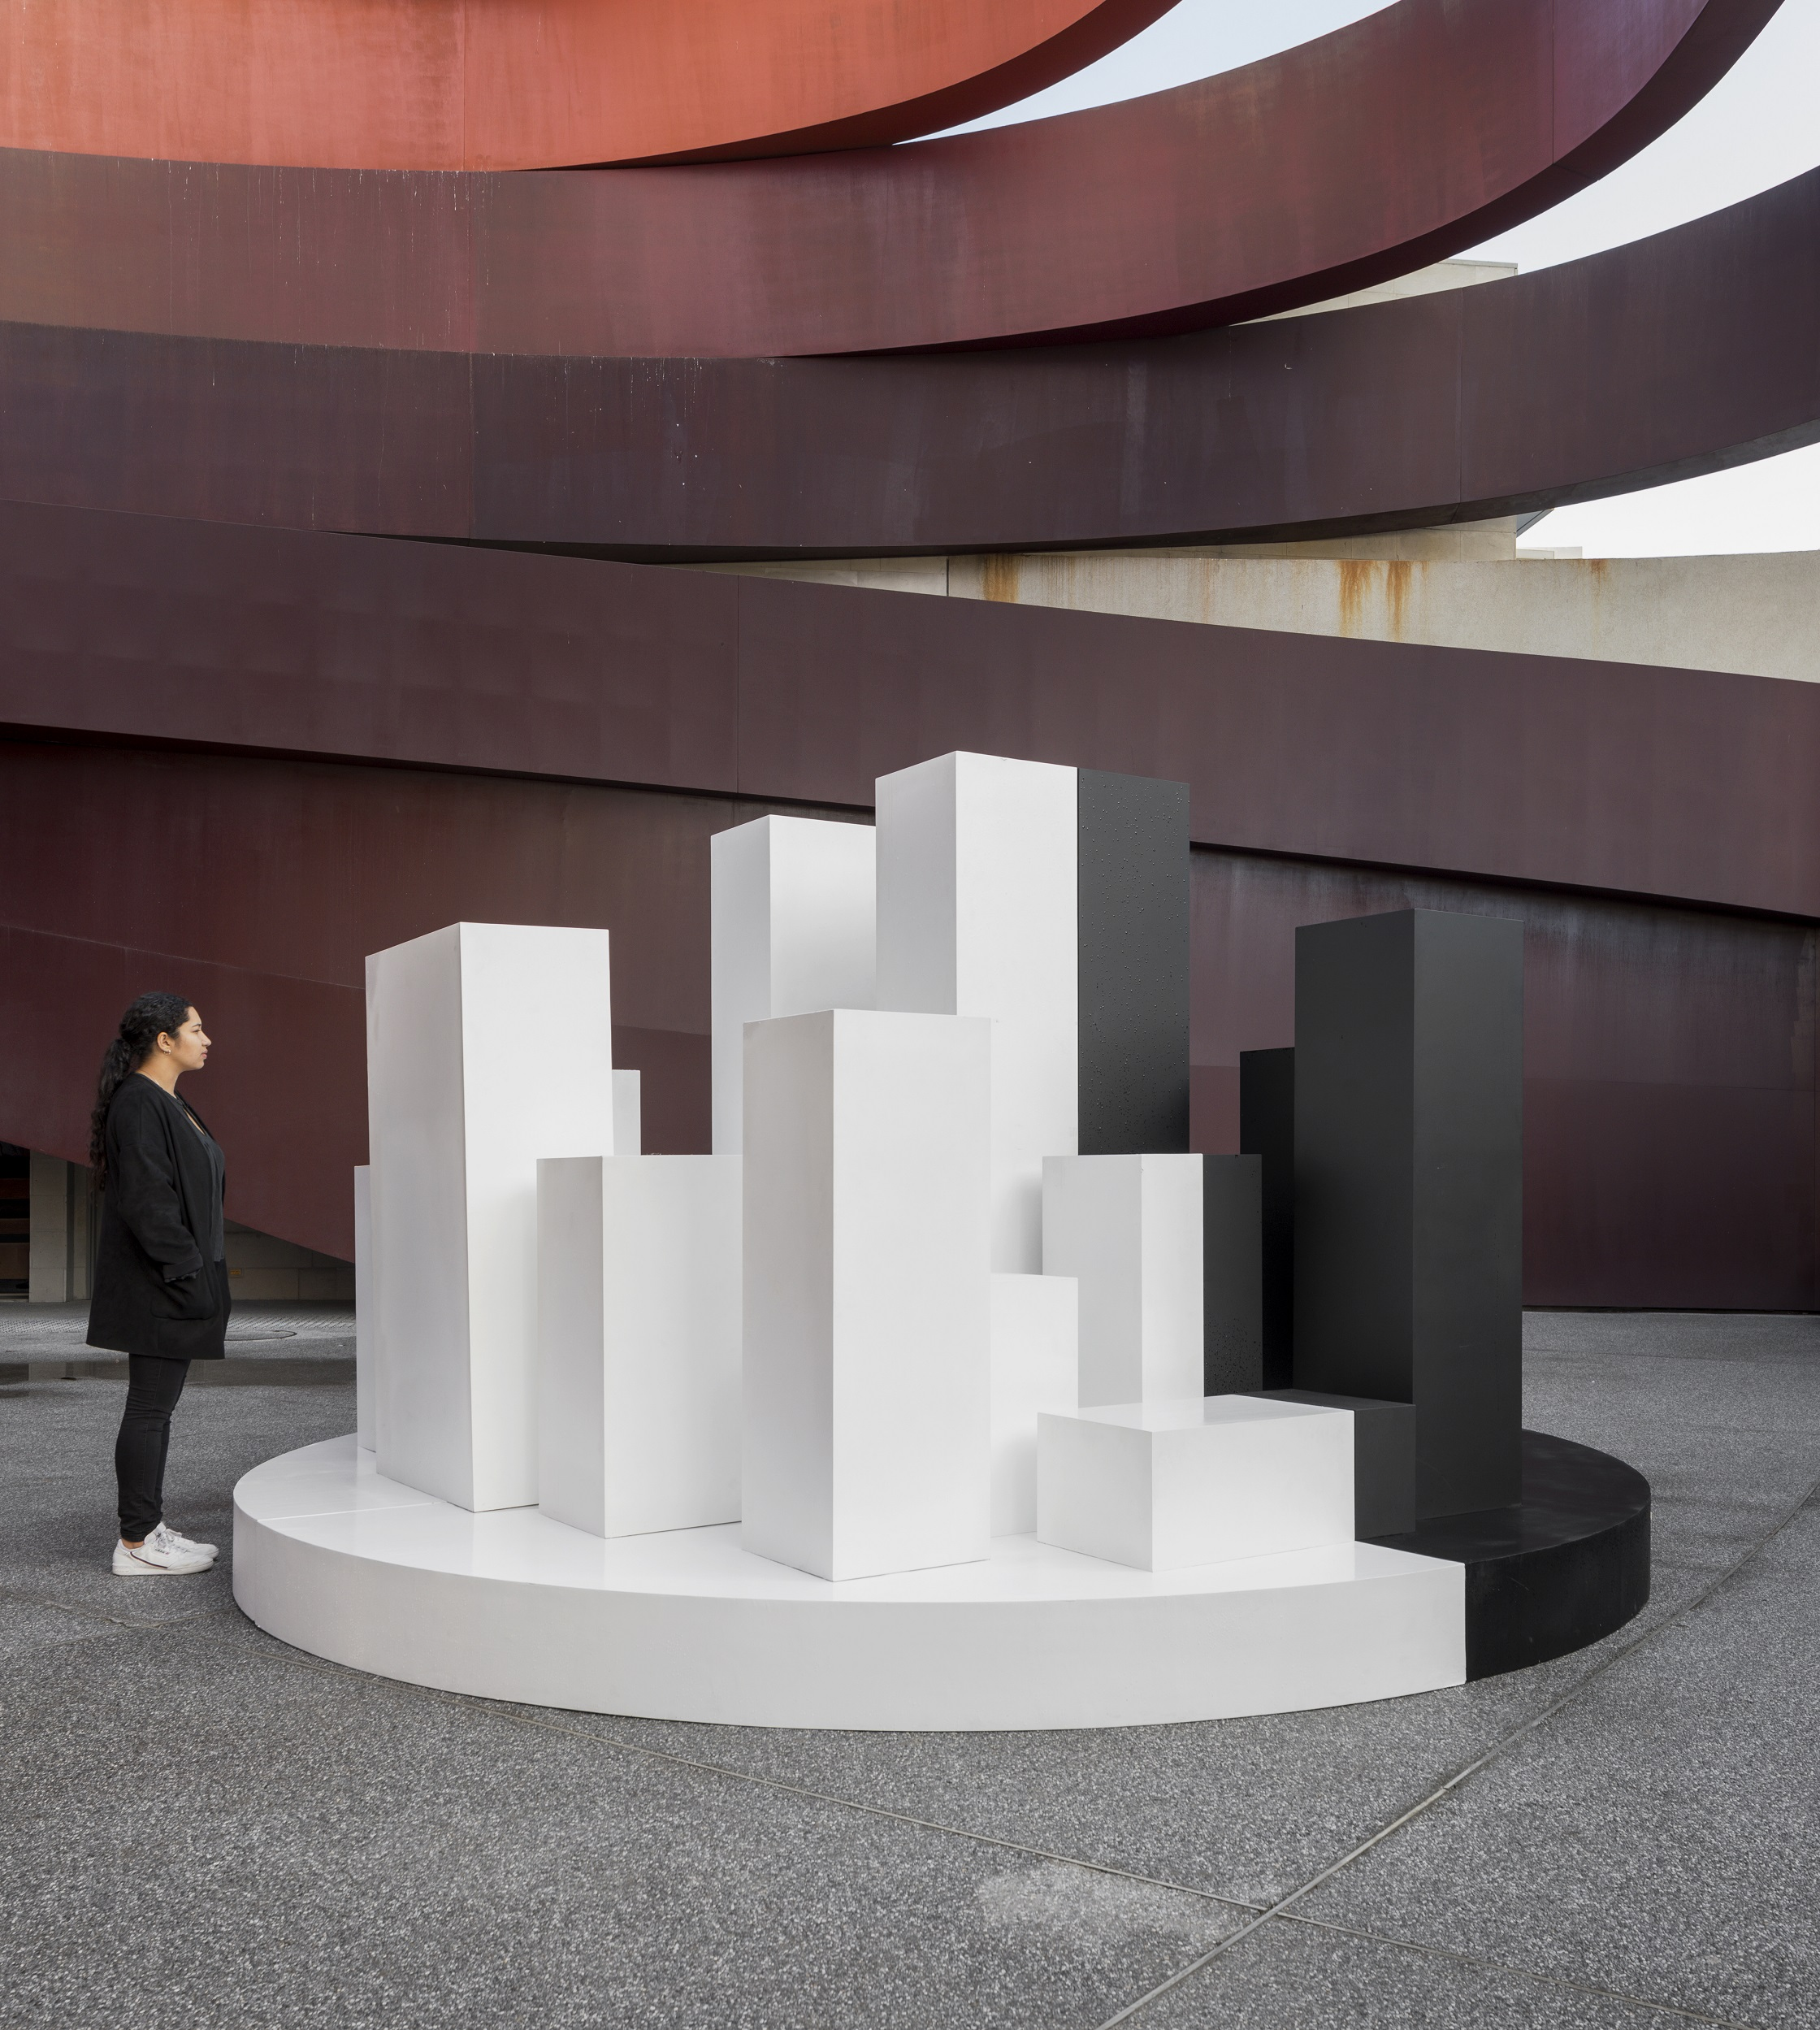 UN STUDIO, הדבר הבא - צבע לבן ייחודי שמפחית התחממות, צילום אלעד שריג